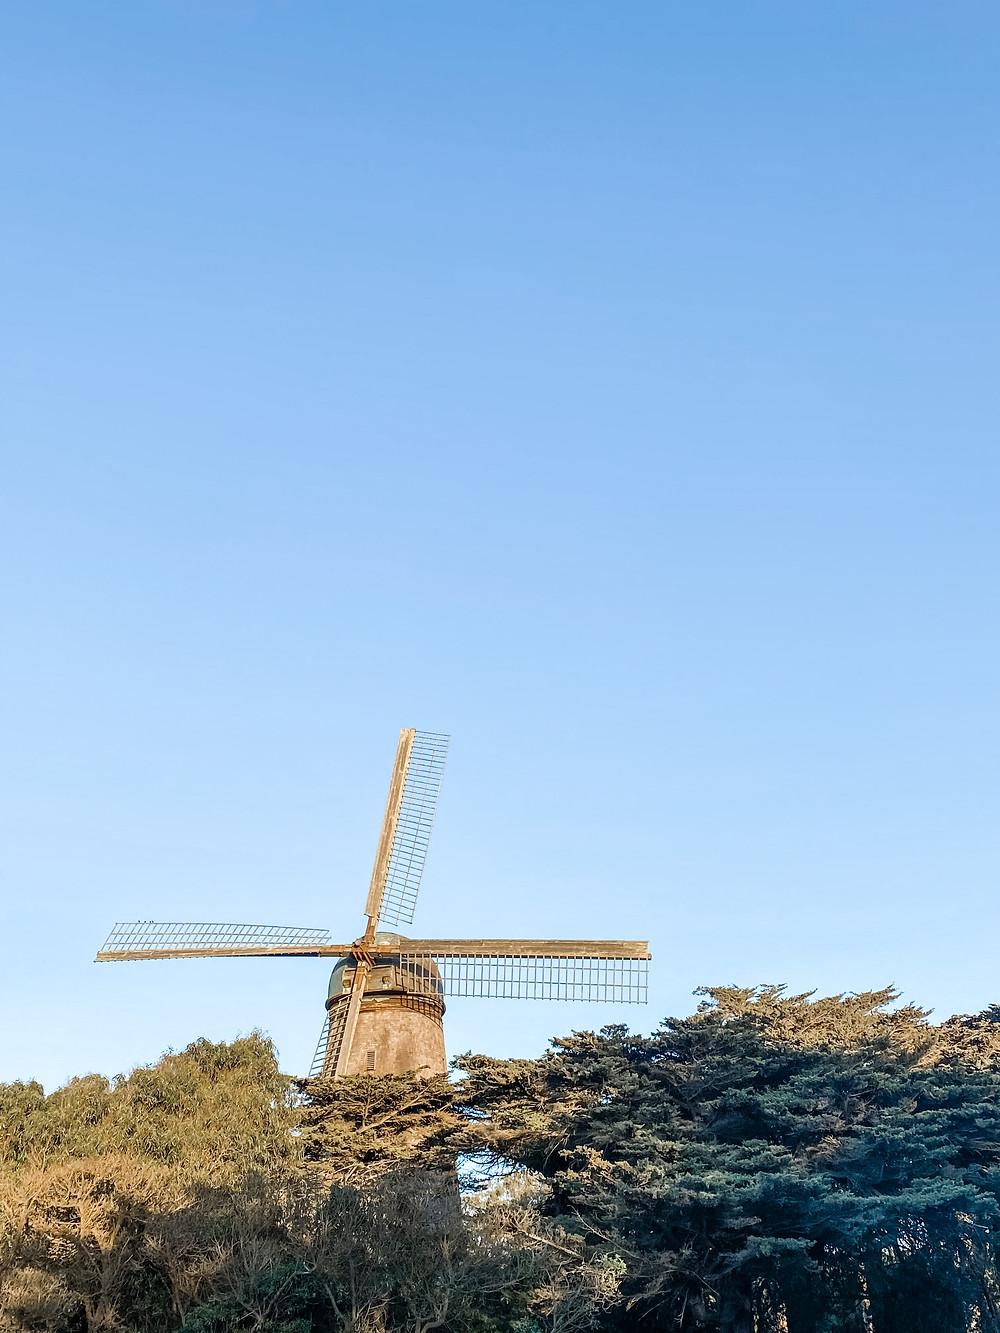 Dutch Windmill in Golden Gate Park, San Francisco